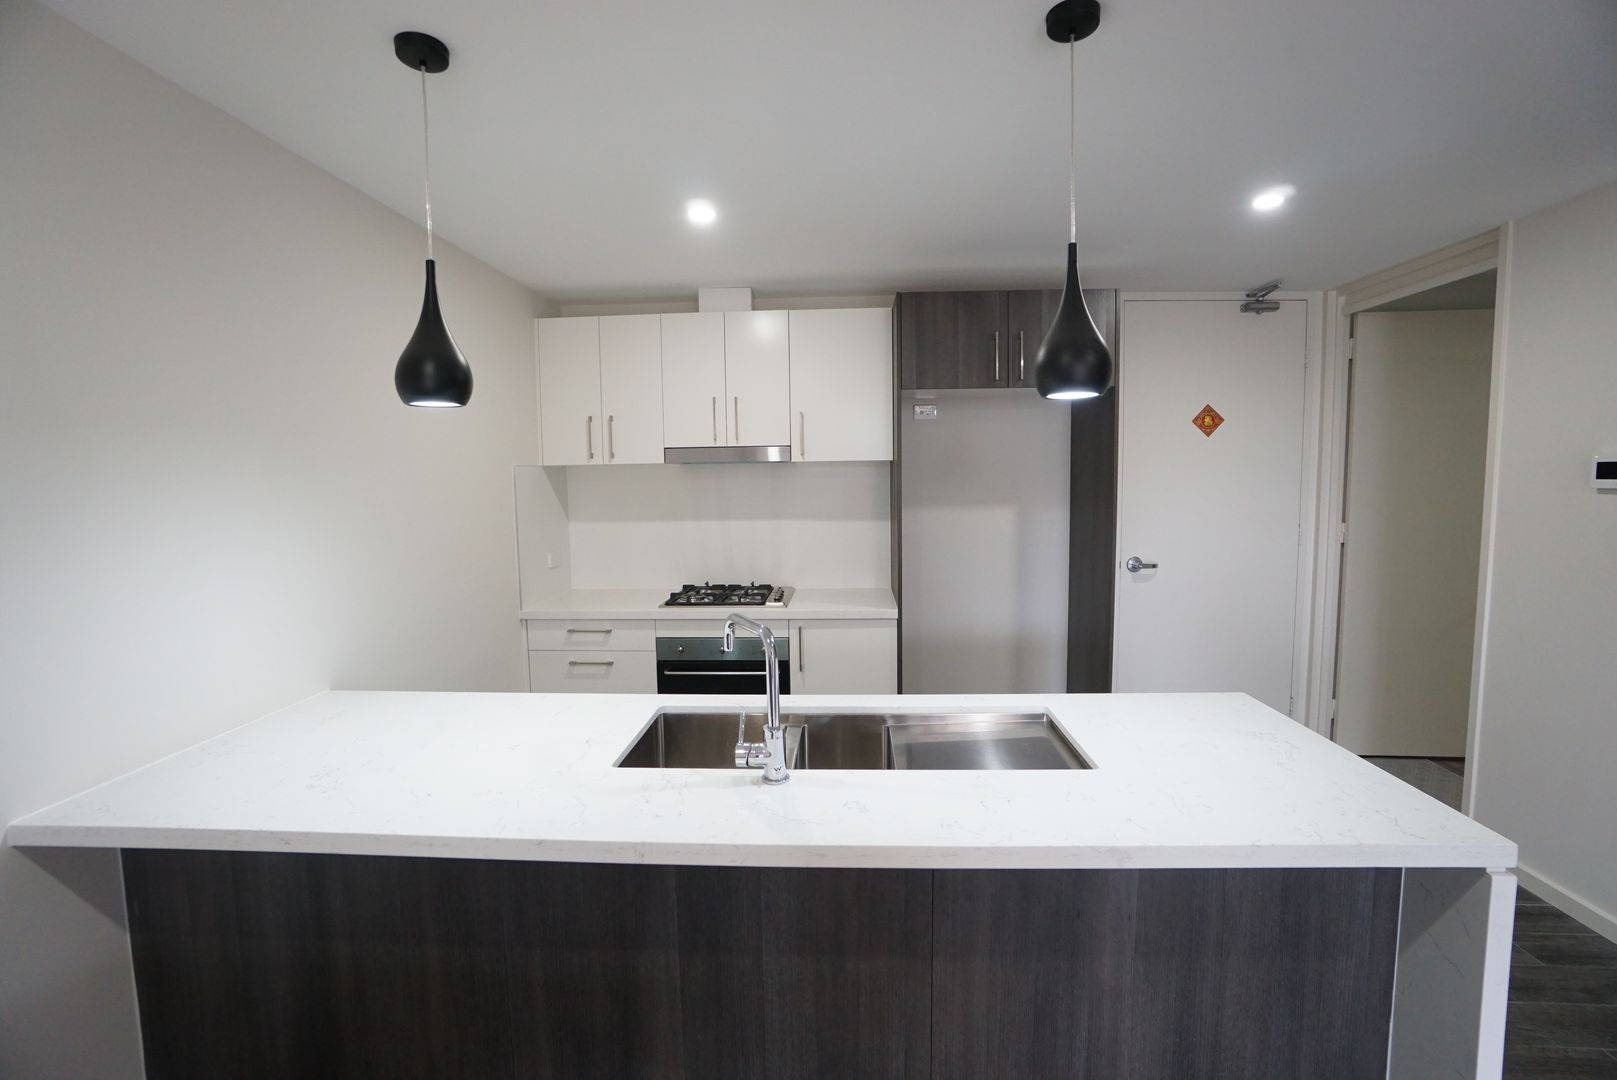 203/20-24 Epping Road, Epping NSW 2121, Image 0